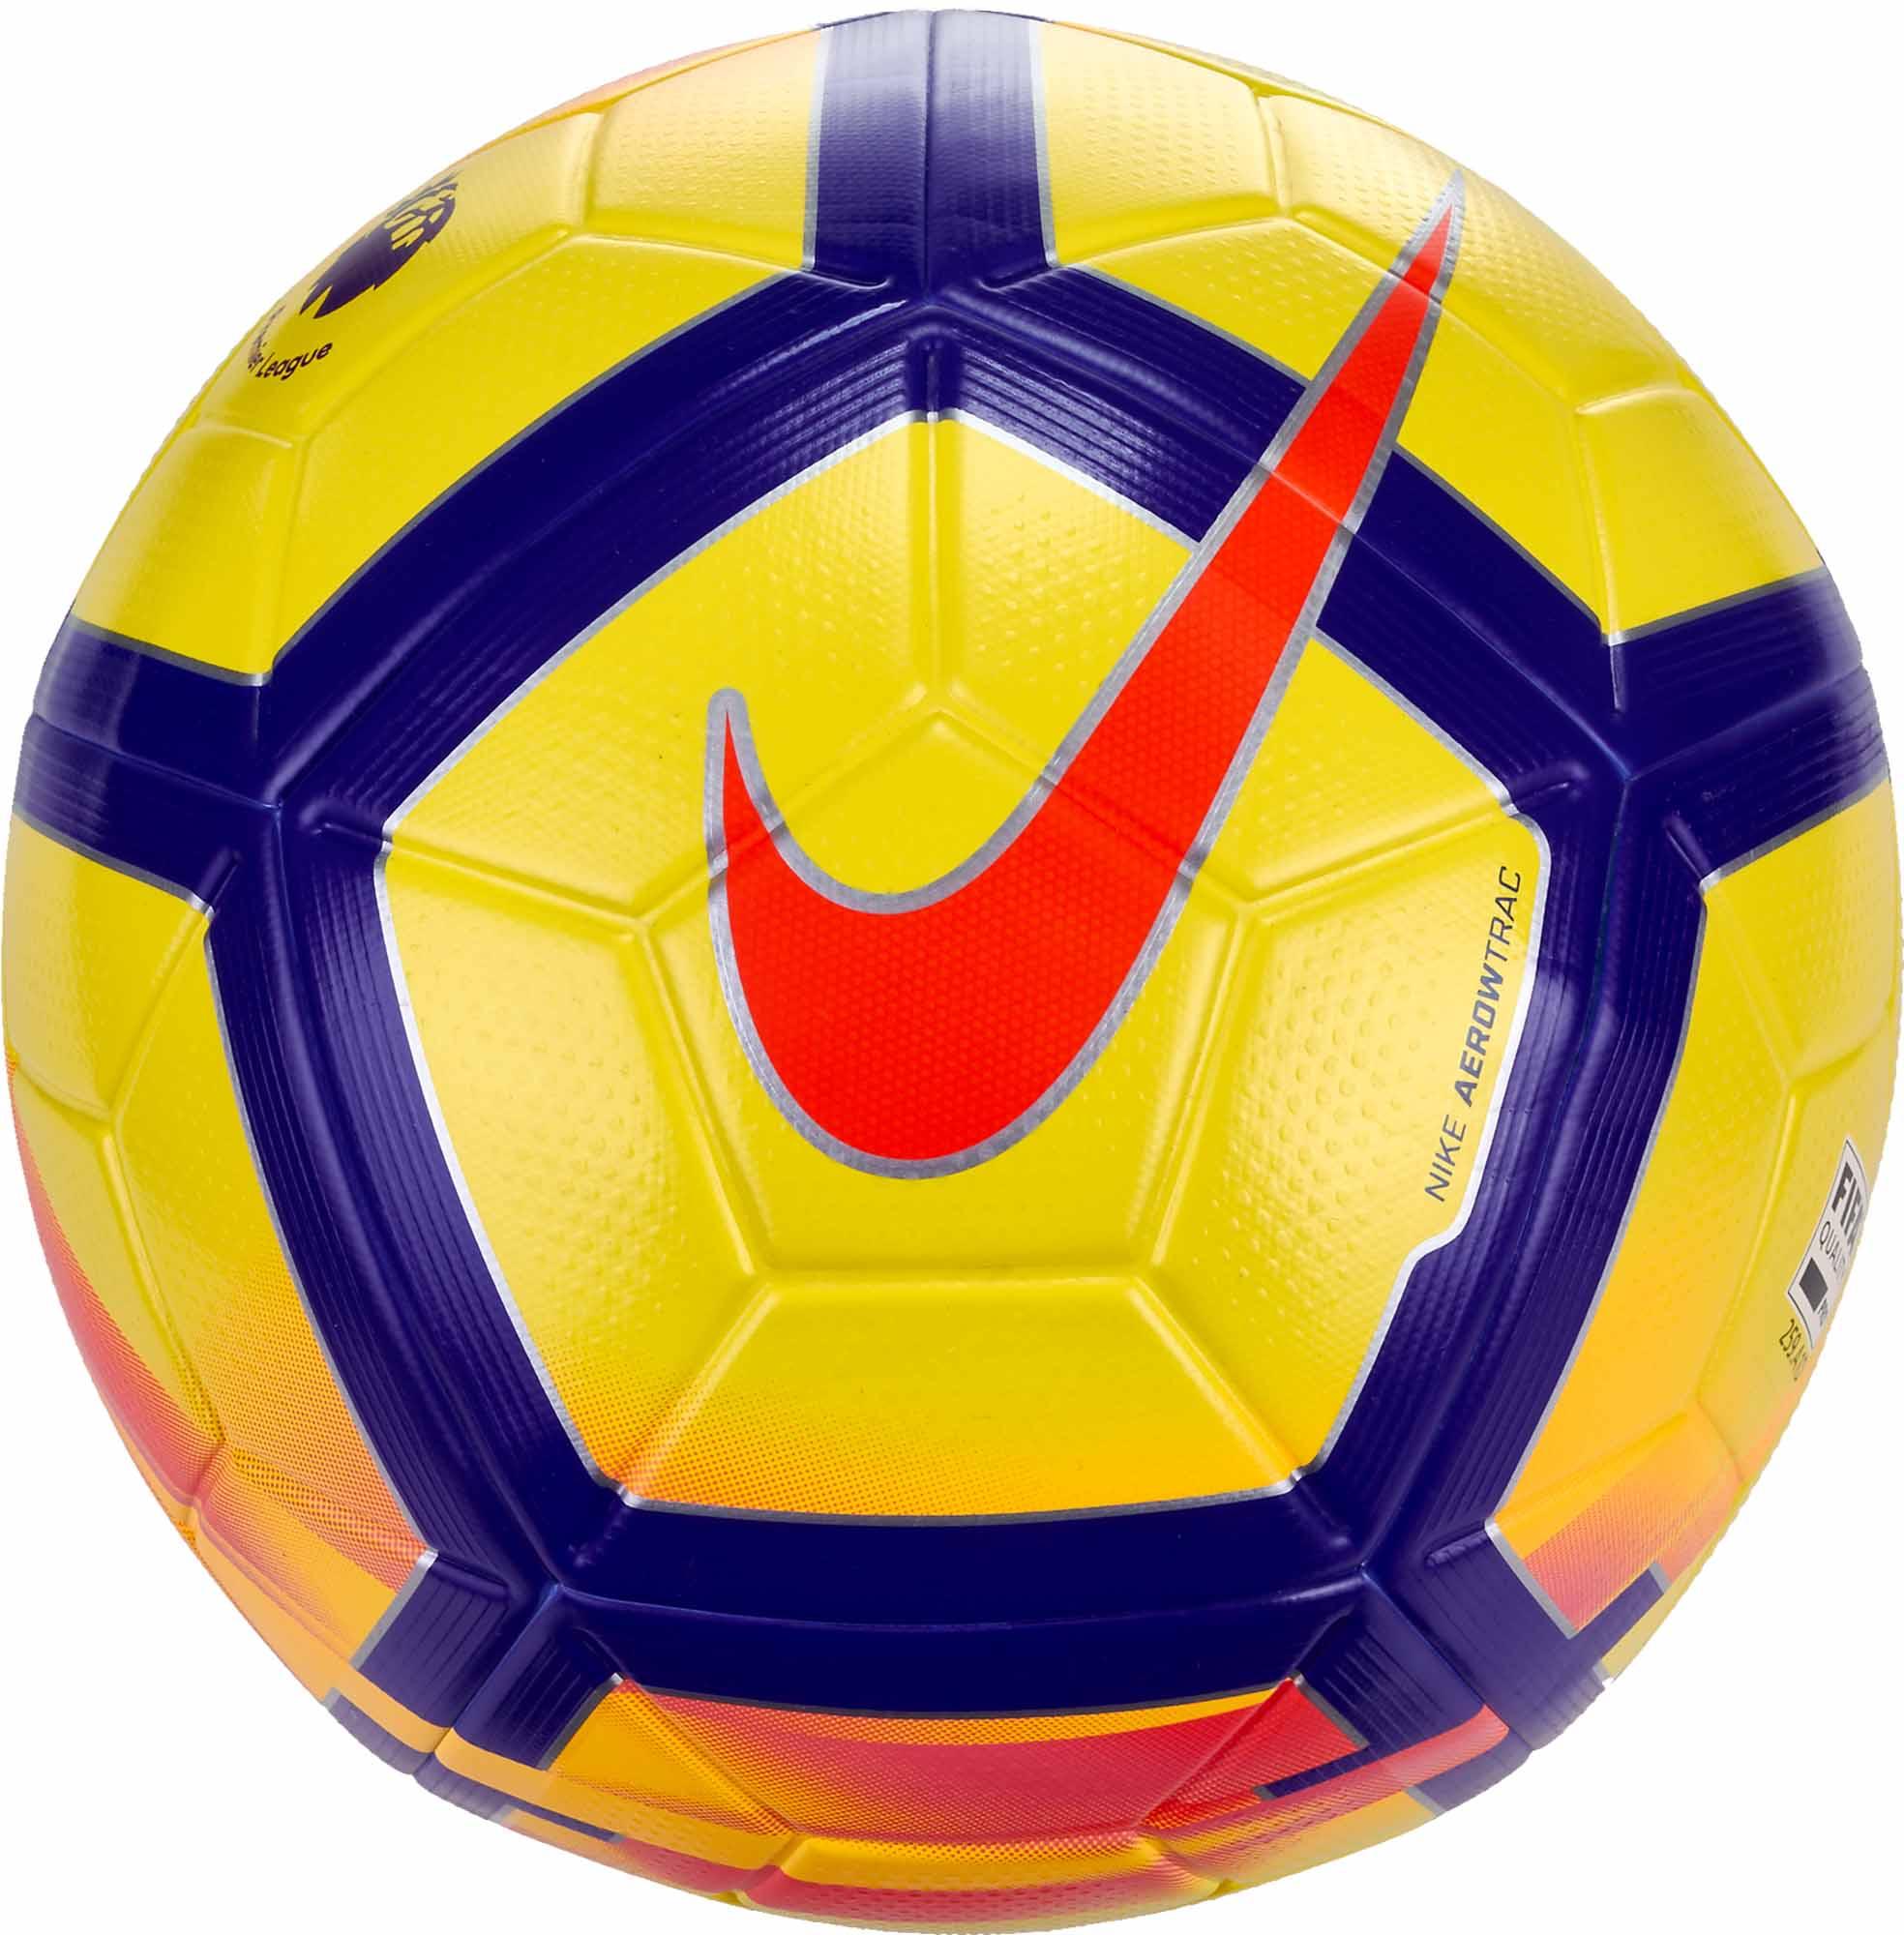 ae4478efc Nike Ordem V Hi-vis Match Ball - Premier League - Yellow & Crimson ...